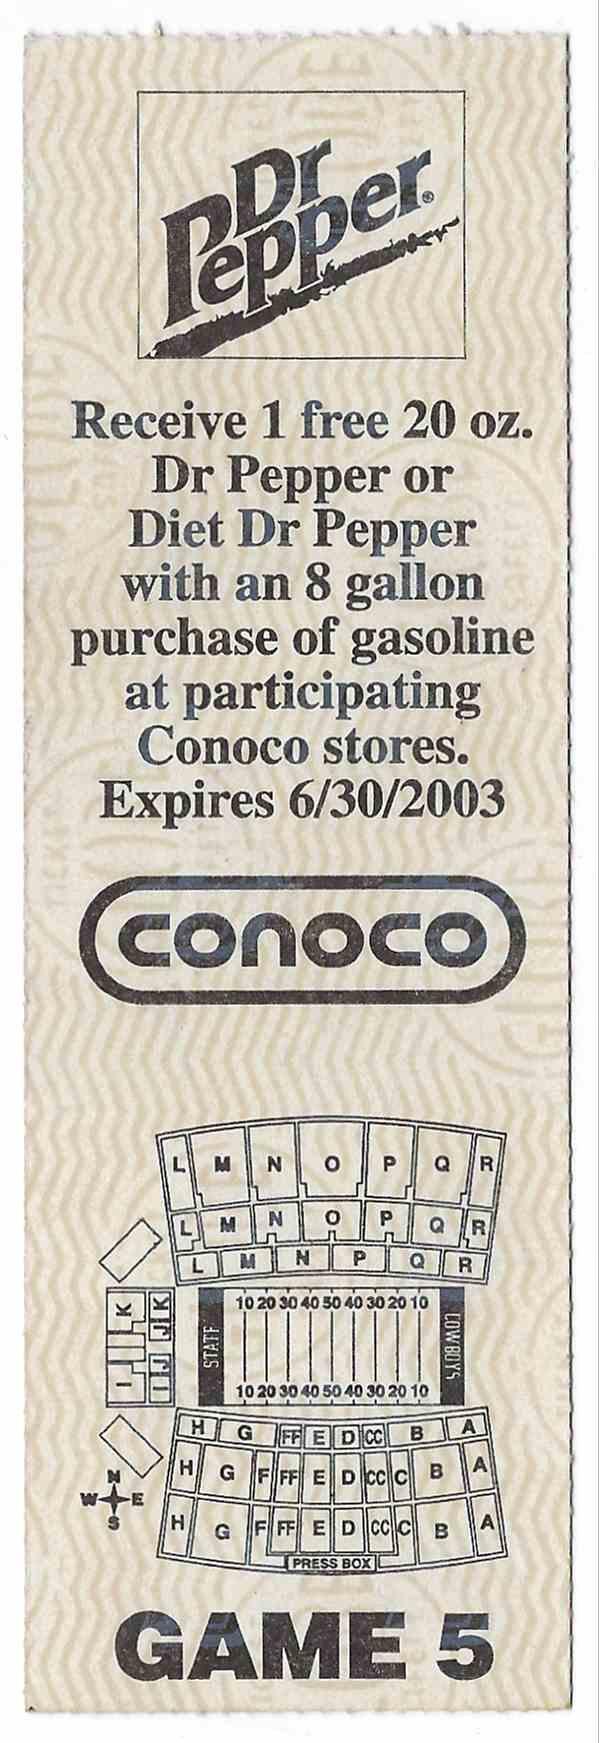 2002 College Football Ticket Stub Texas A&M Vs Oklahoma State card back image